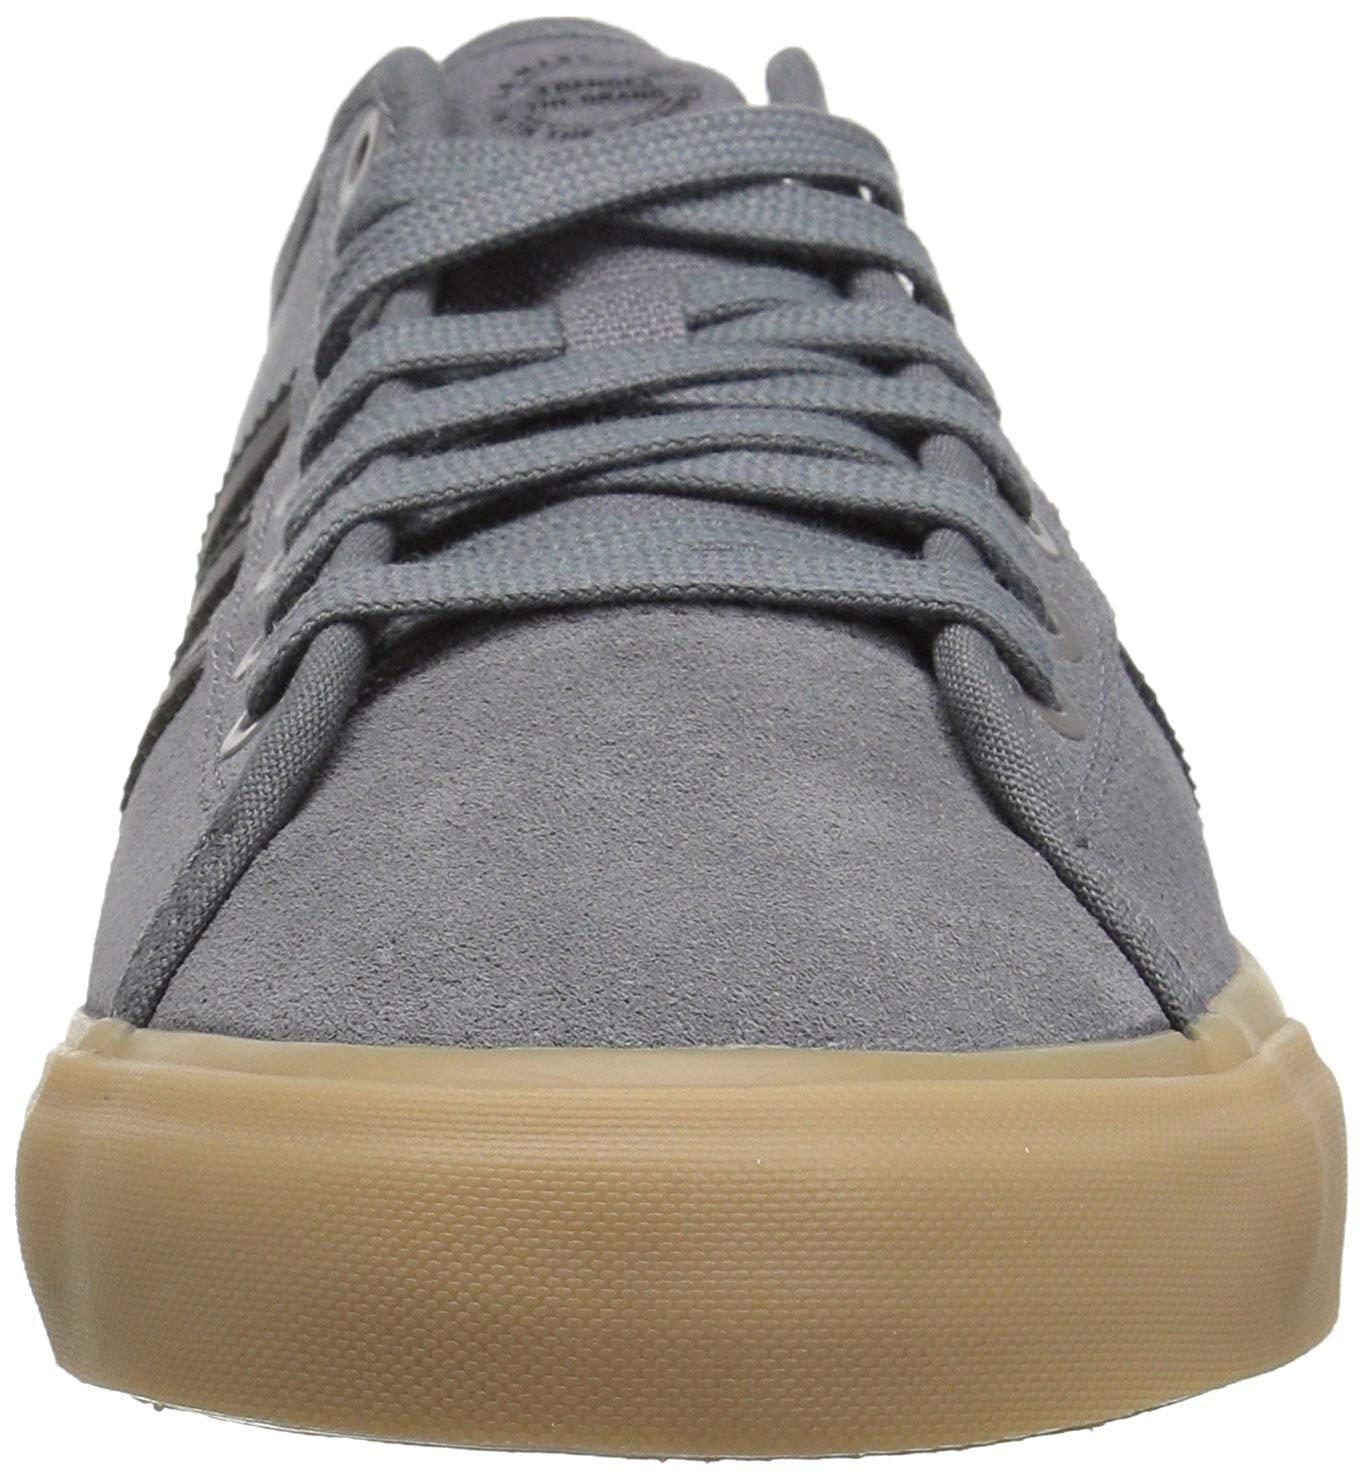 70d41461ef9 adidas Men s Matchcourt Rx Skate Shoe